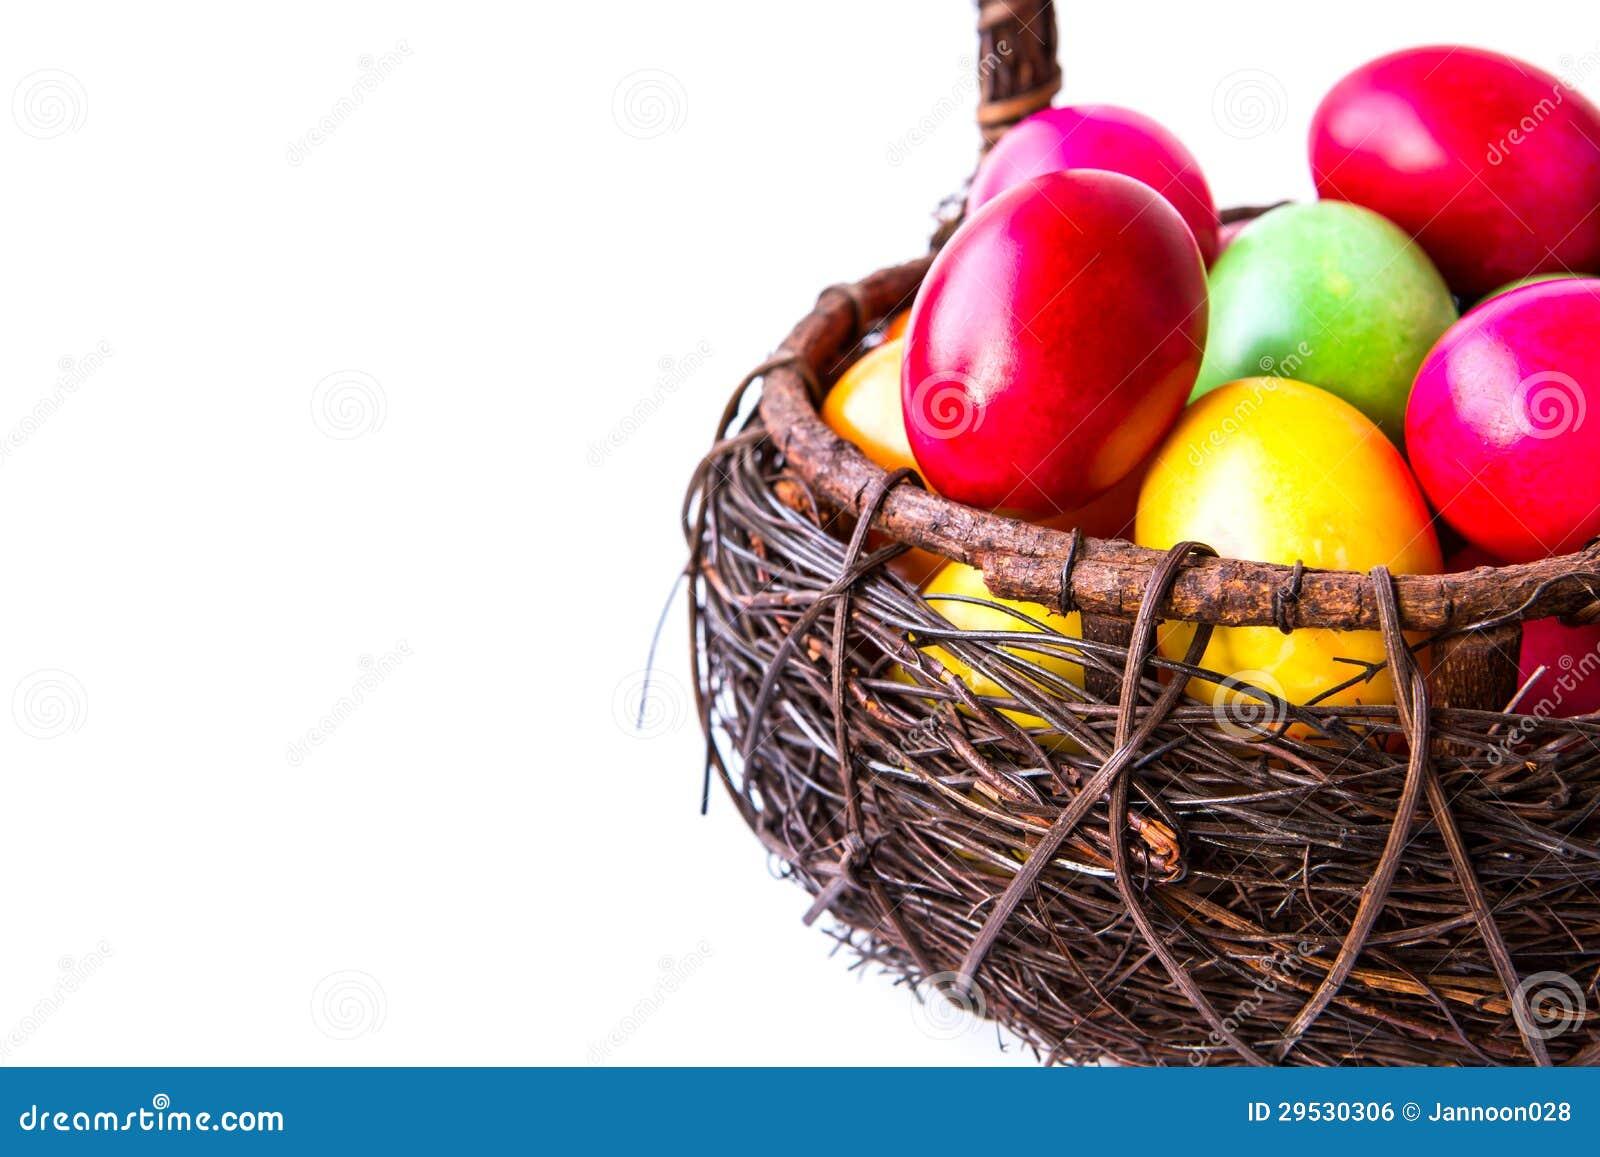 Ovos da páscoa coloridos na cesta marrom